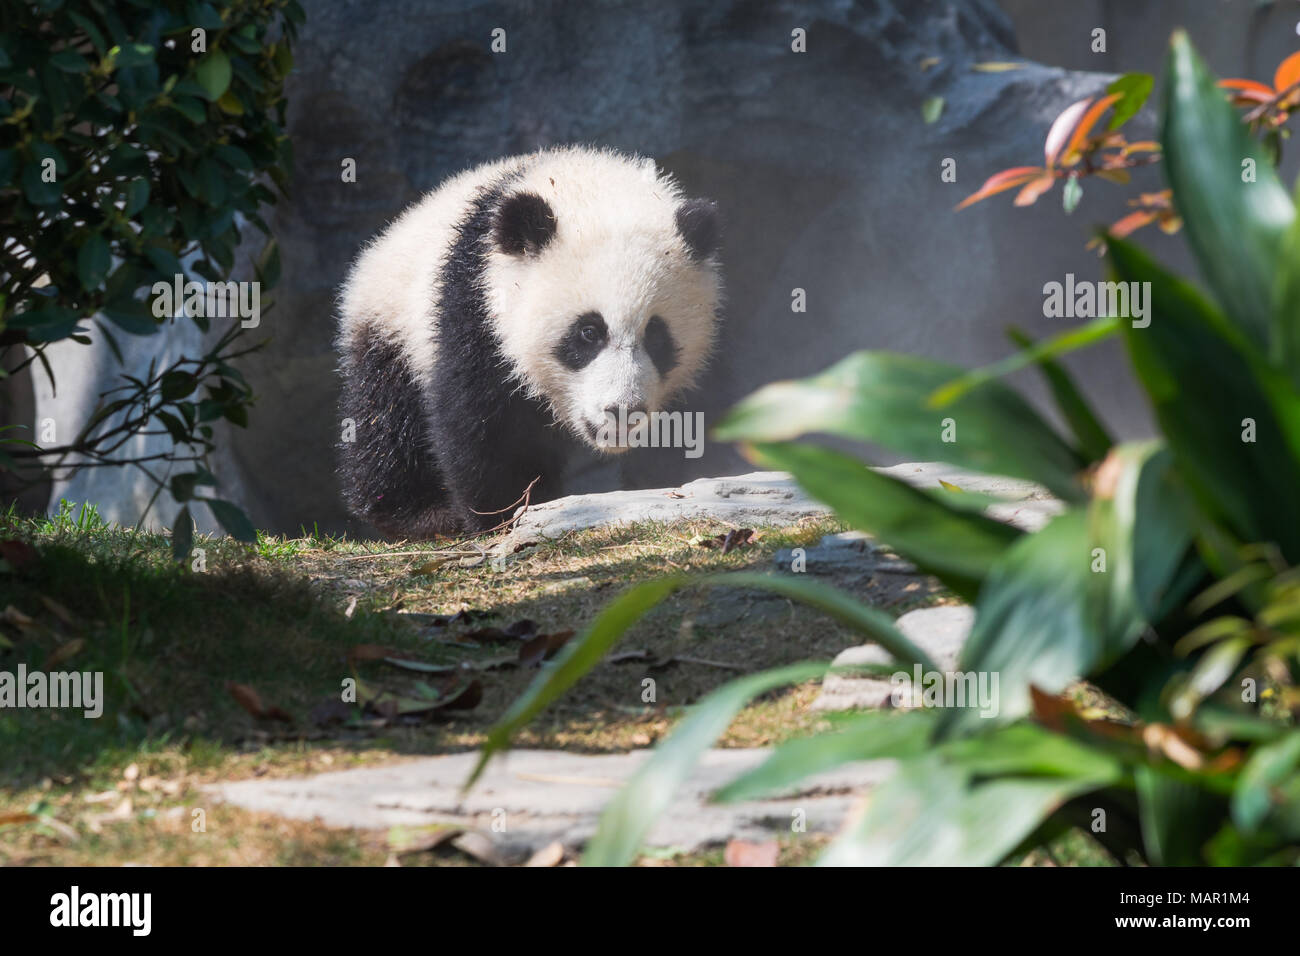 Panda cub walking in sunshine, Chengdu, China Stock Photo